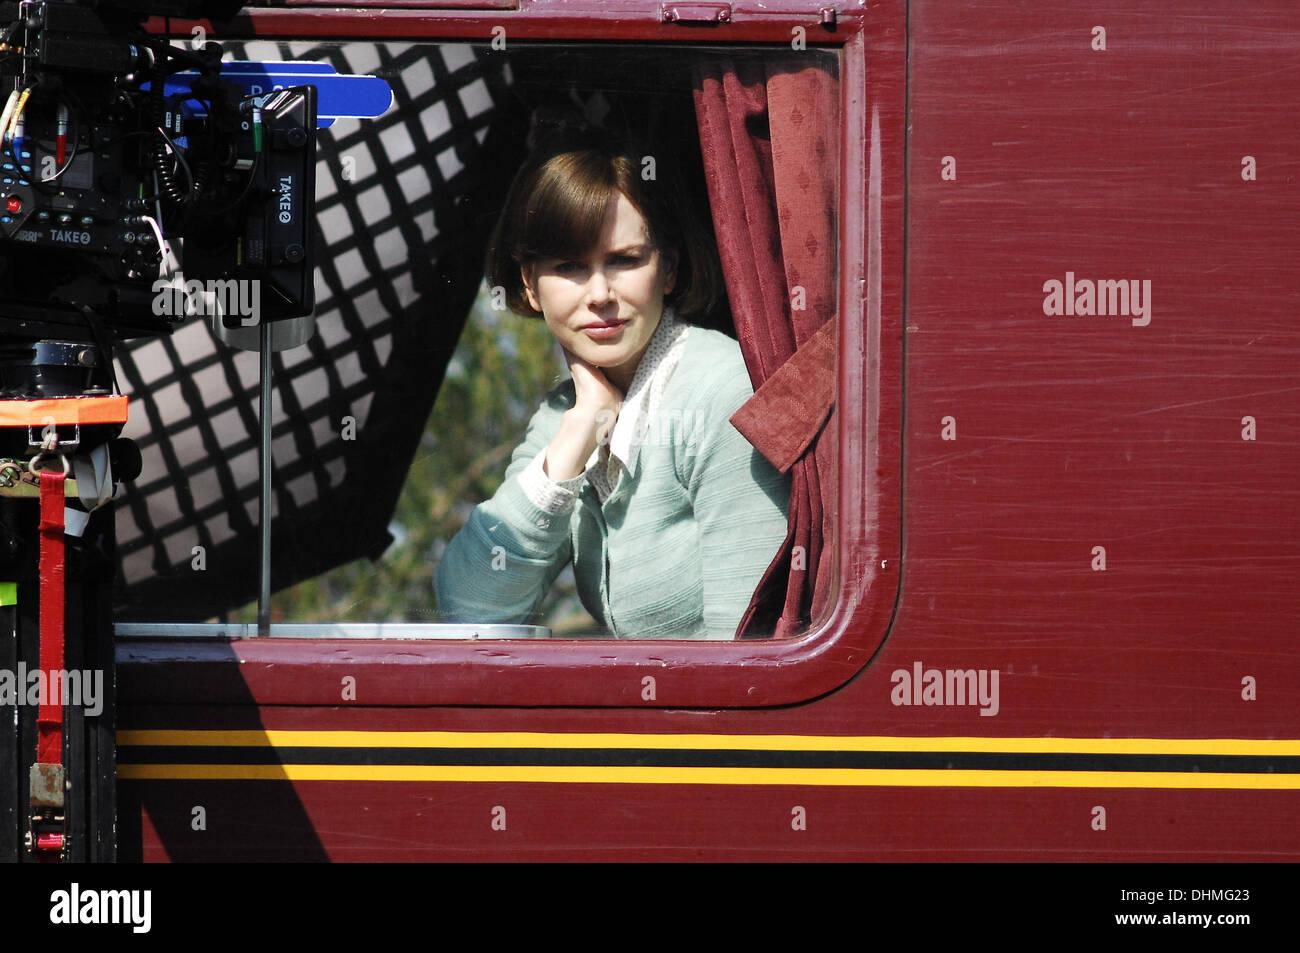 Nicole Kidman Filming A Train Scene From The Movie The Railway Man